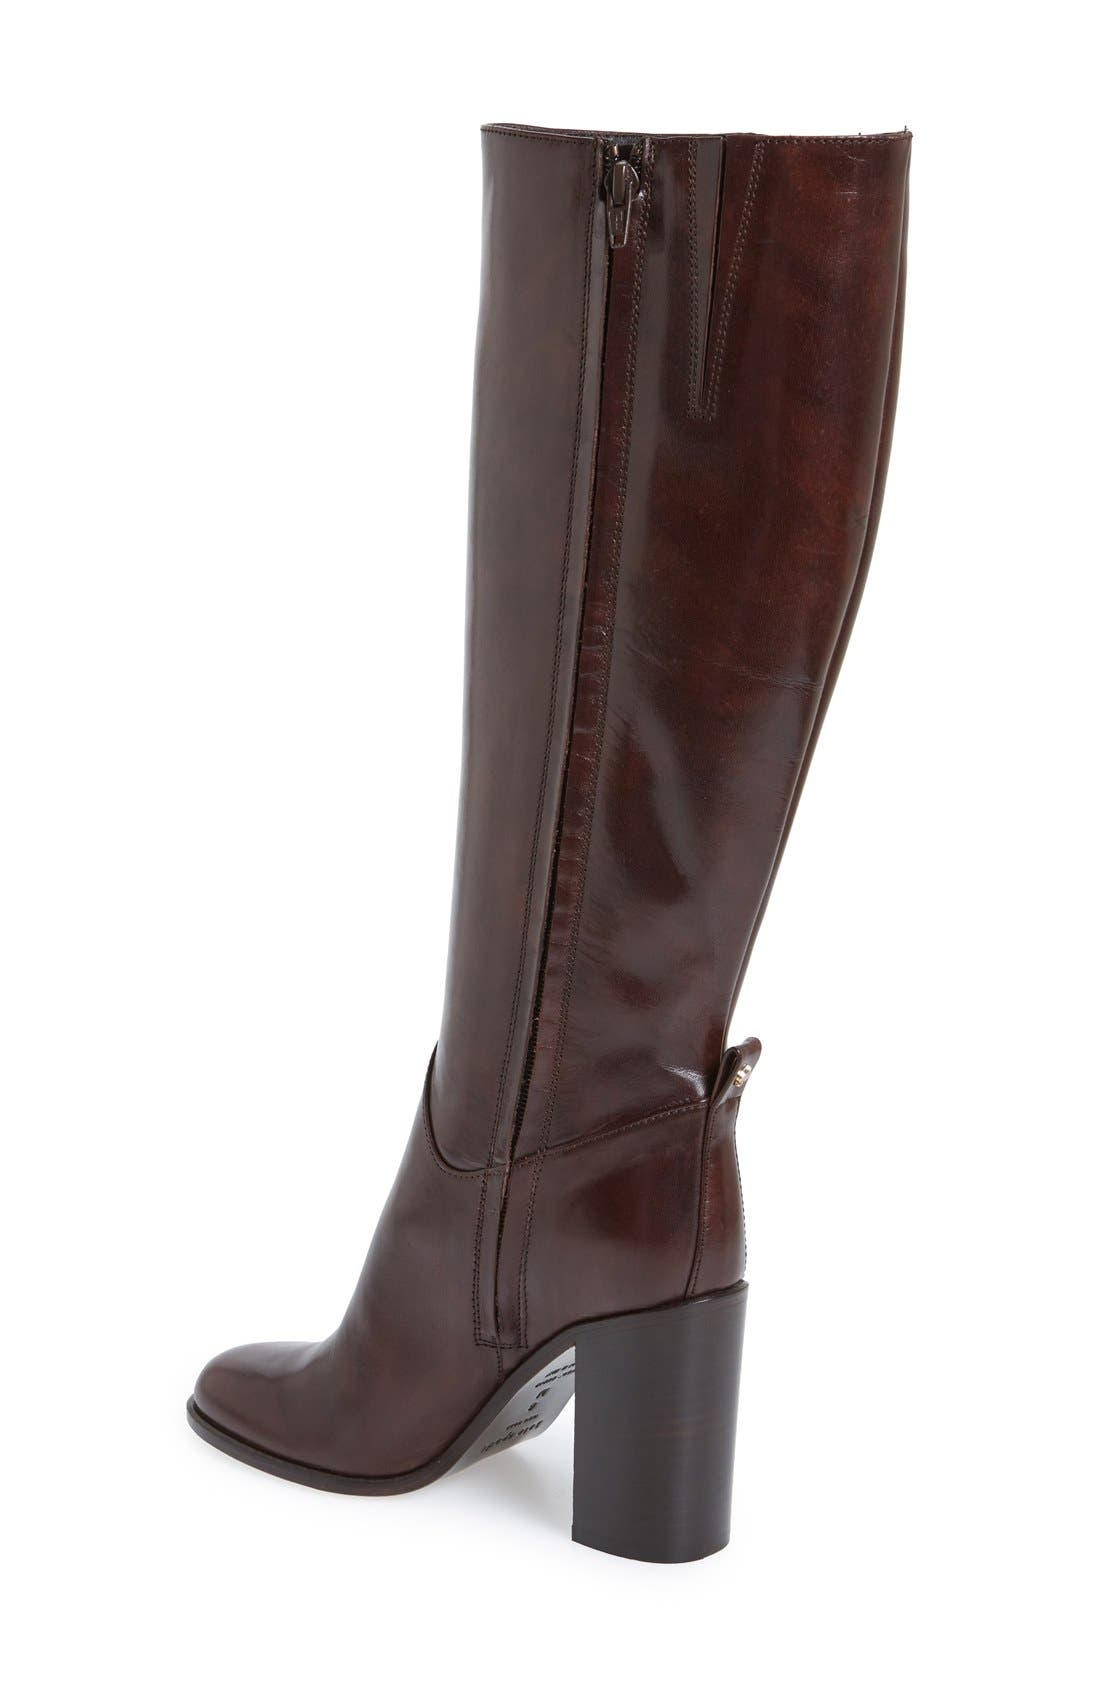 Alternate Image 2  - kate spade new york 'baina' tall boot (Women)